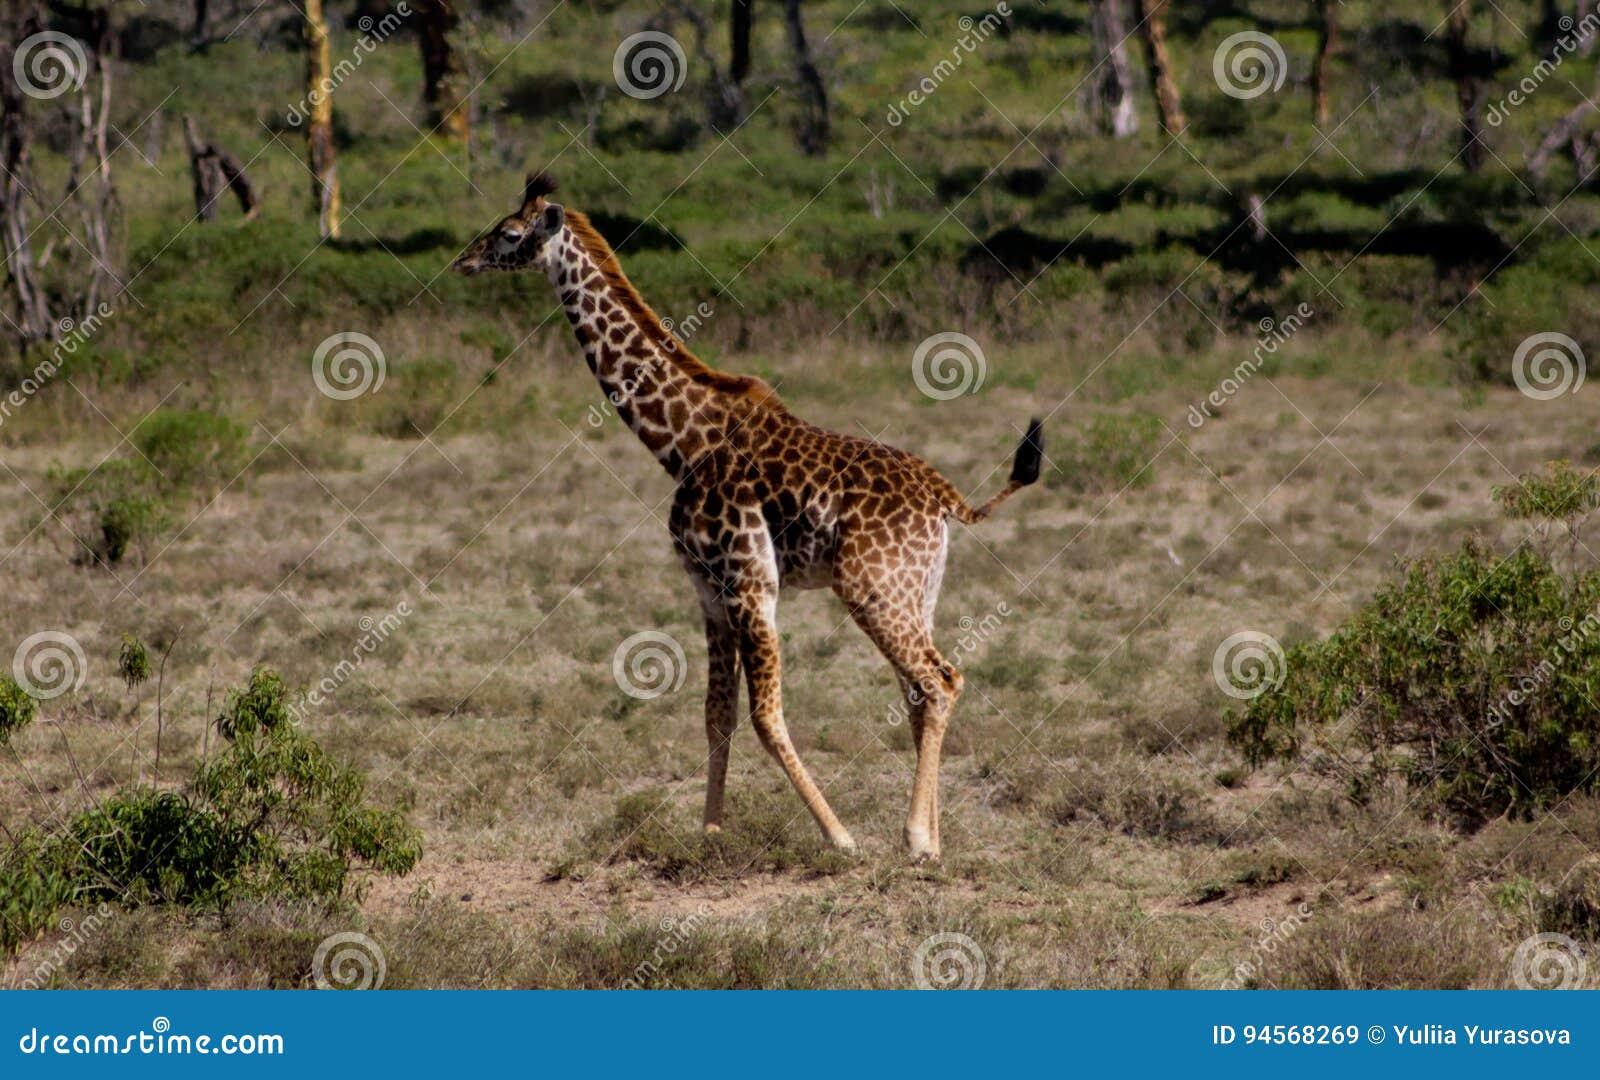 Small baby giraffe